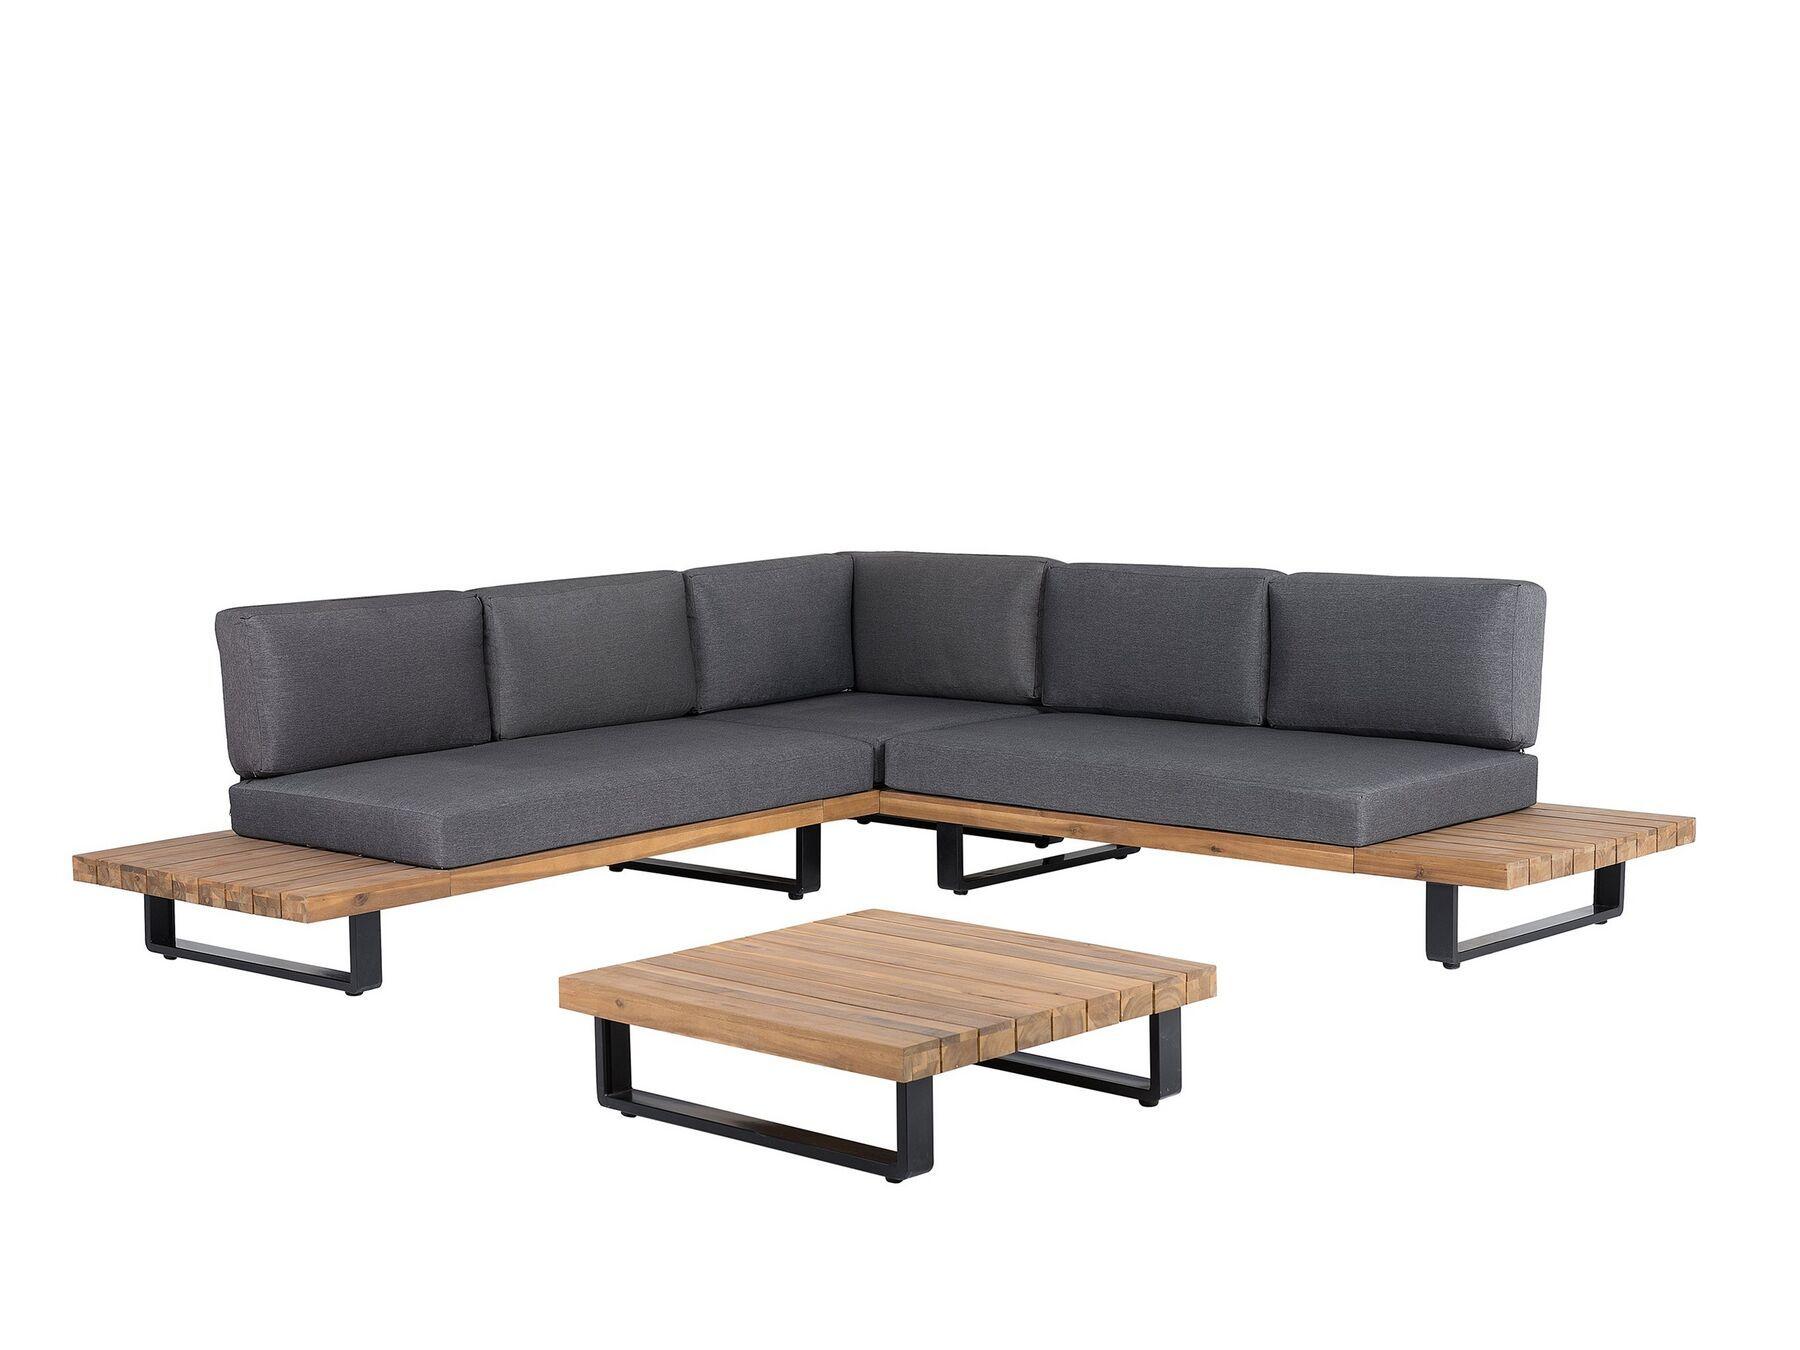 Salon De Jardin Gris Et Bois Clair Mykonos Beliani Fr Gartenmobel Outdoor Sofa Sets Garten Lounge